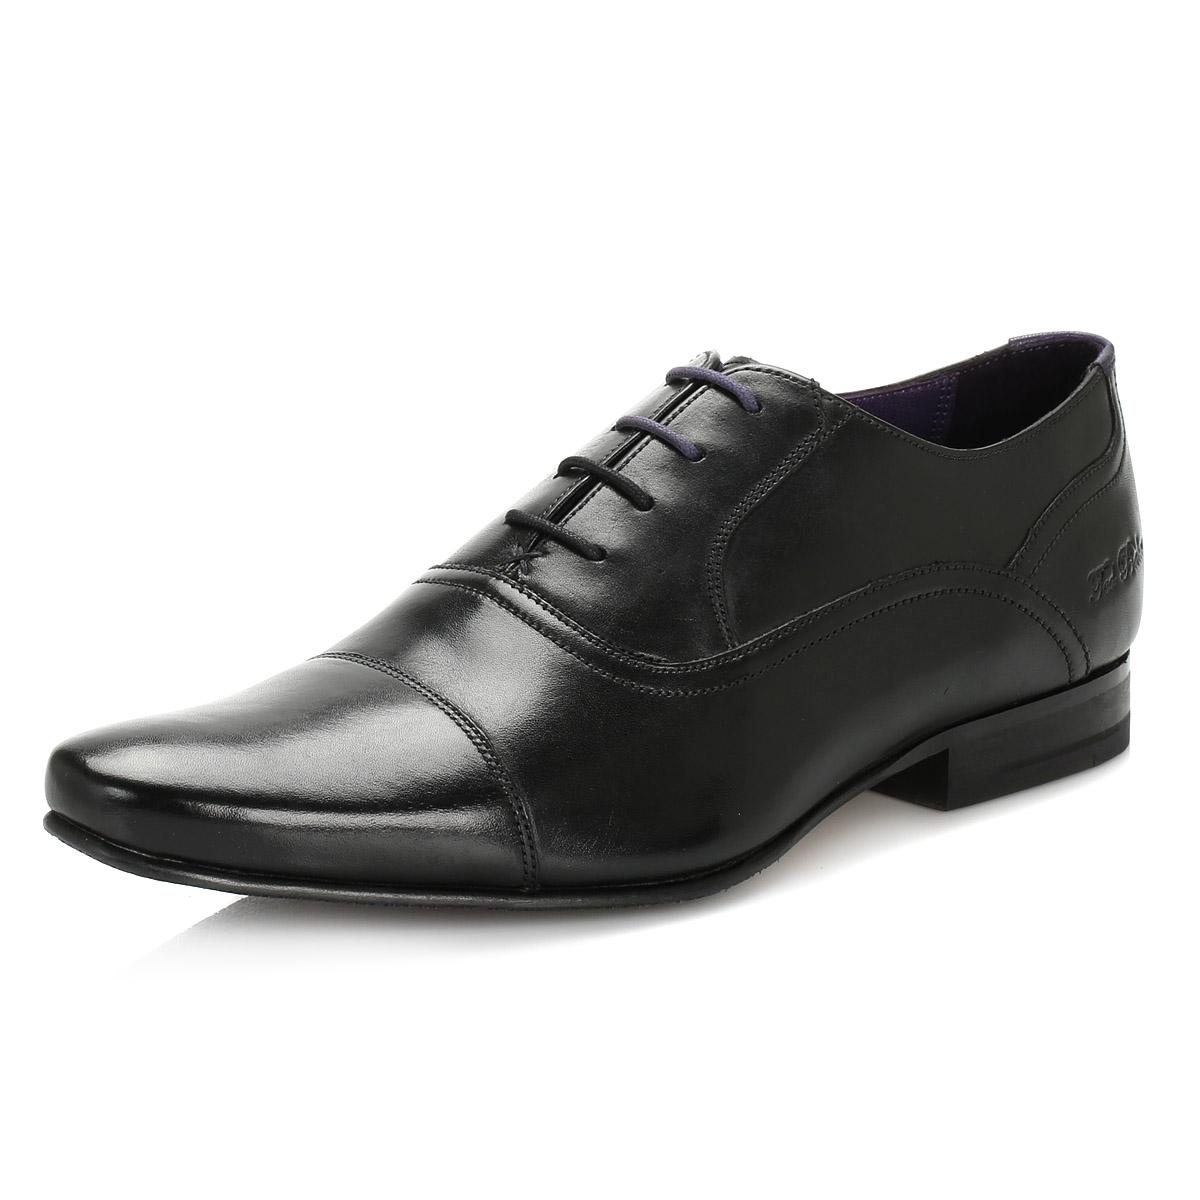 ted baker mens oxford shoes black or brown rogrr 2